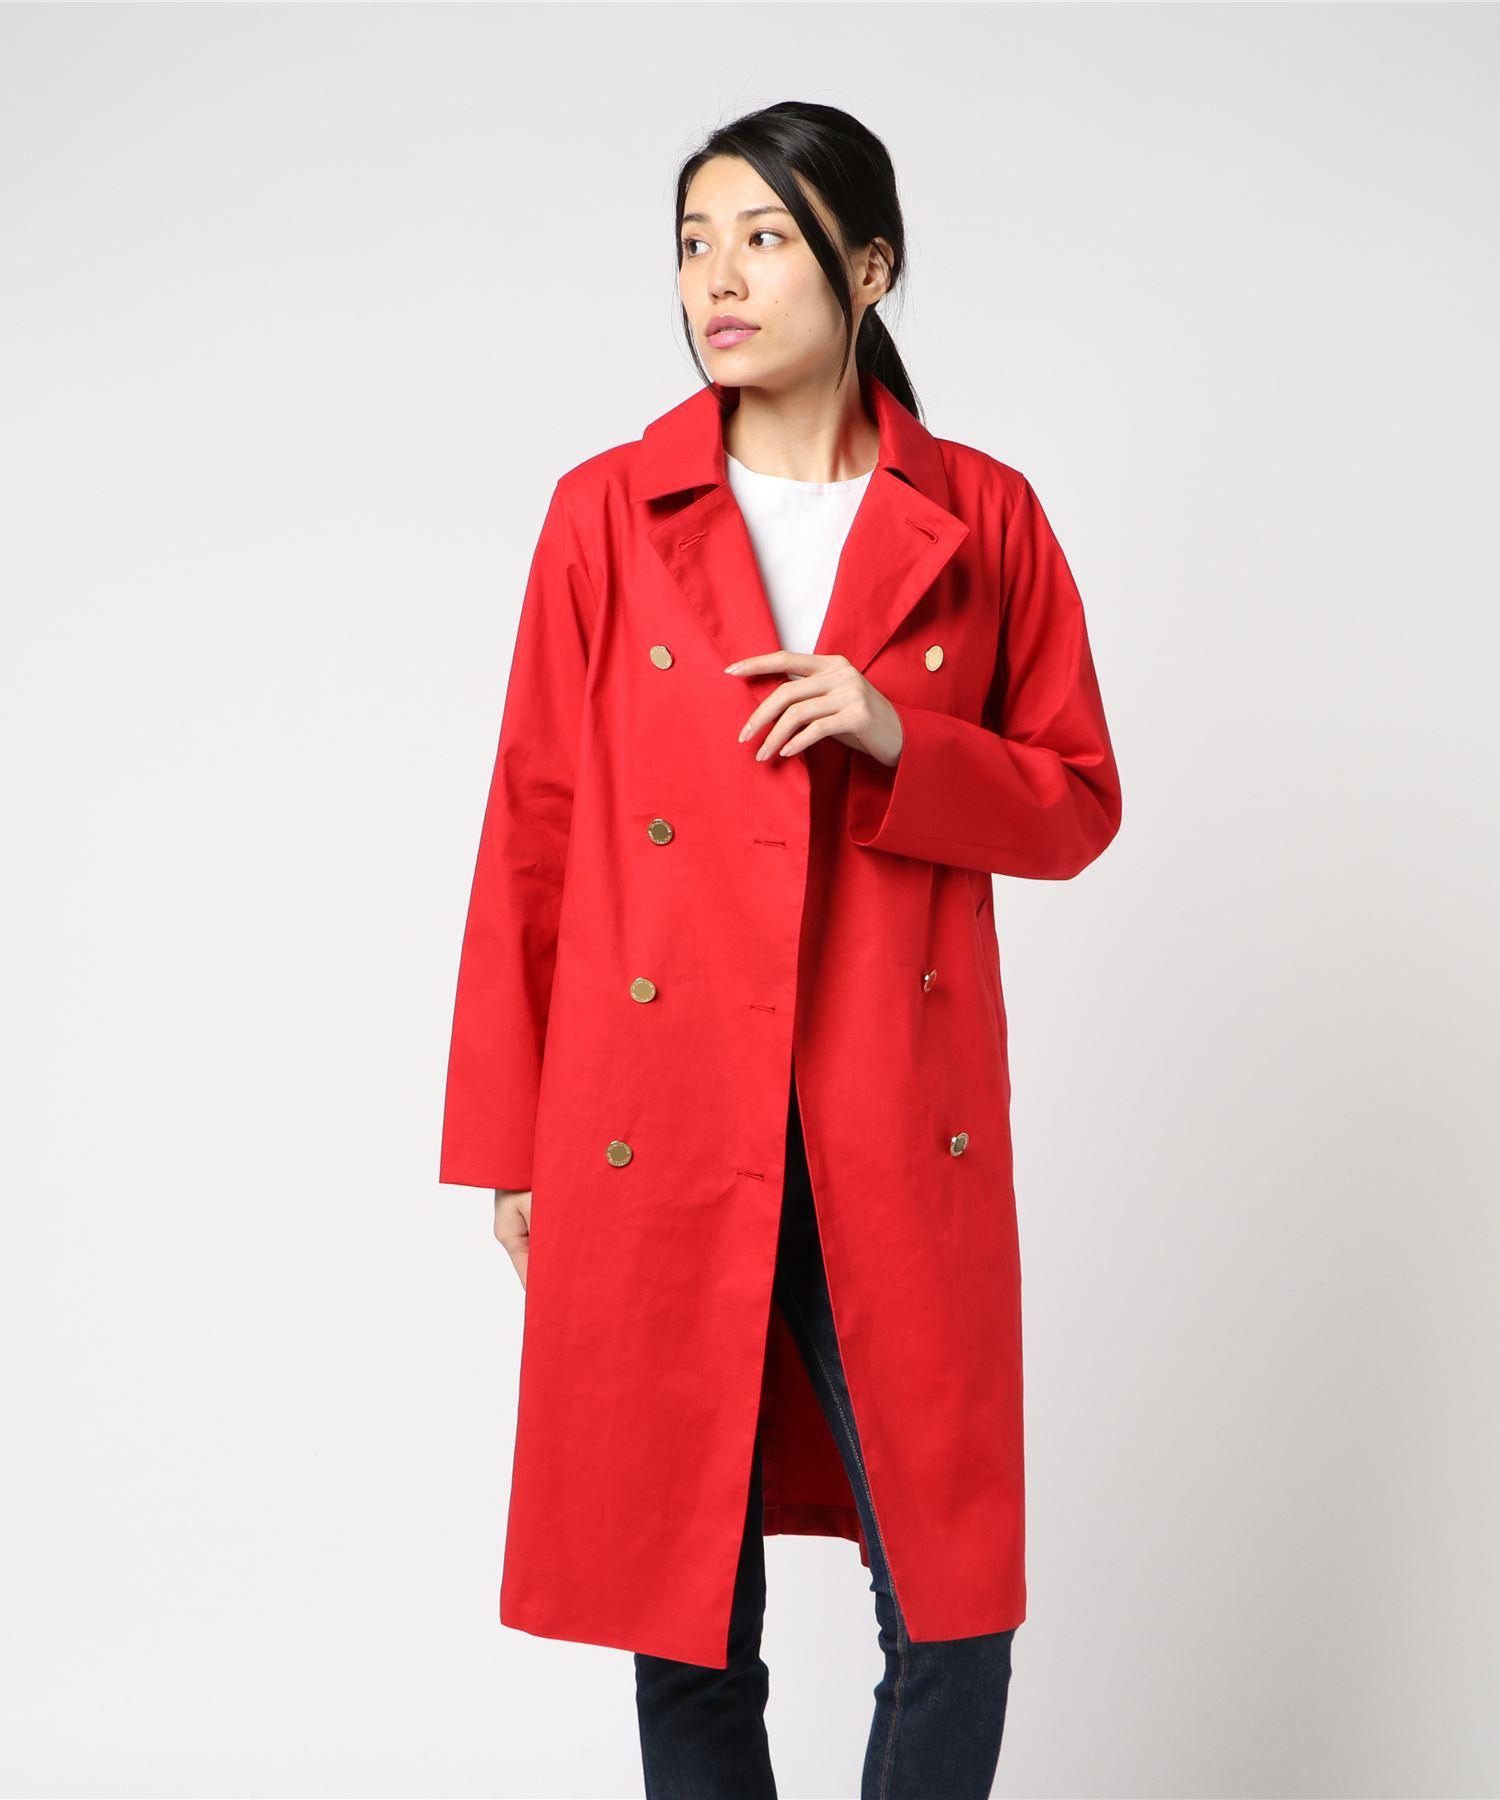 Traditional Weatherwear トラディショナル ウェザーウェア/トレンチコート